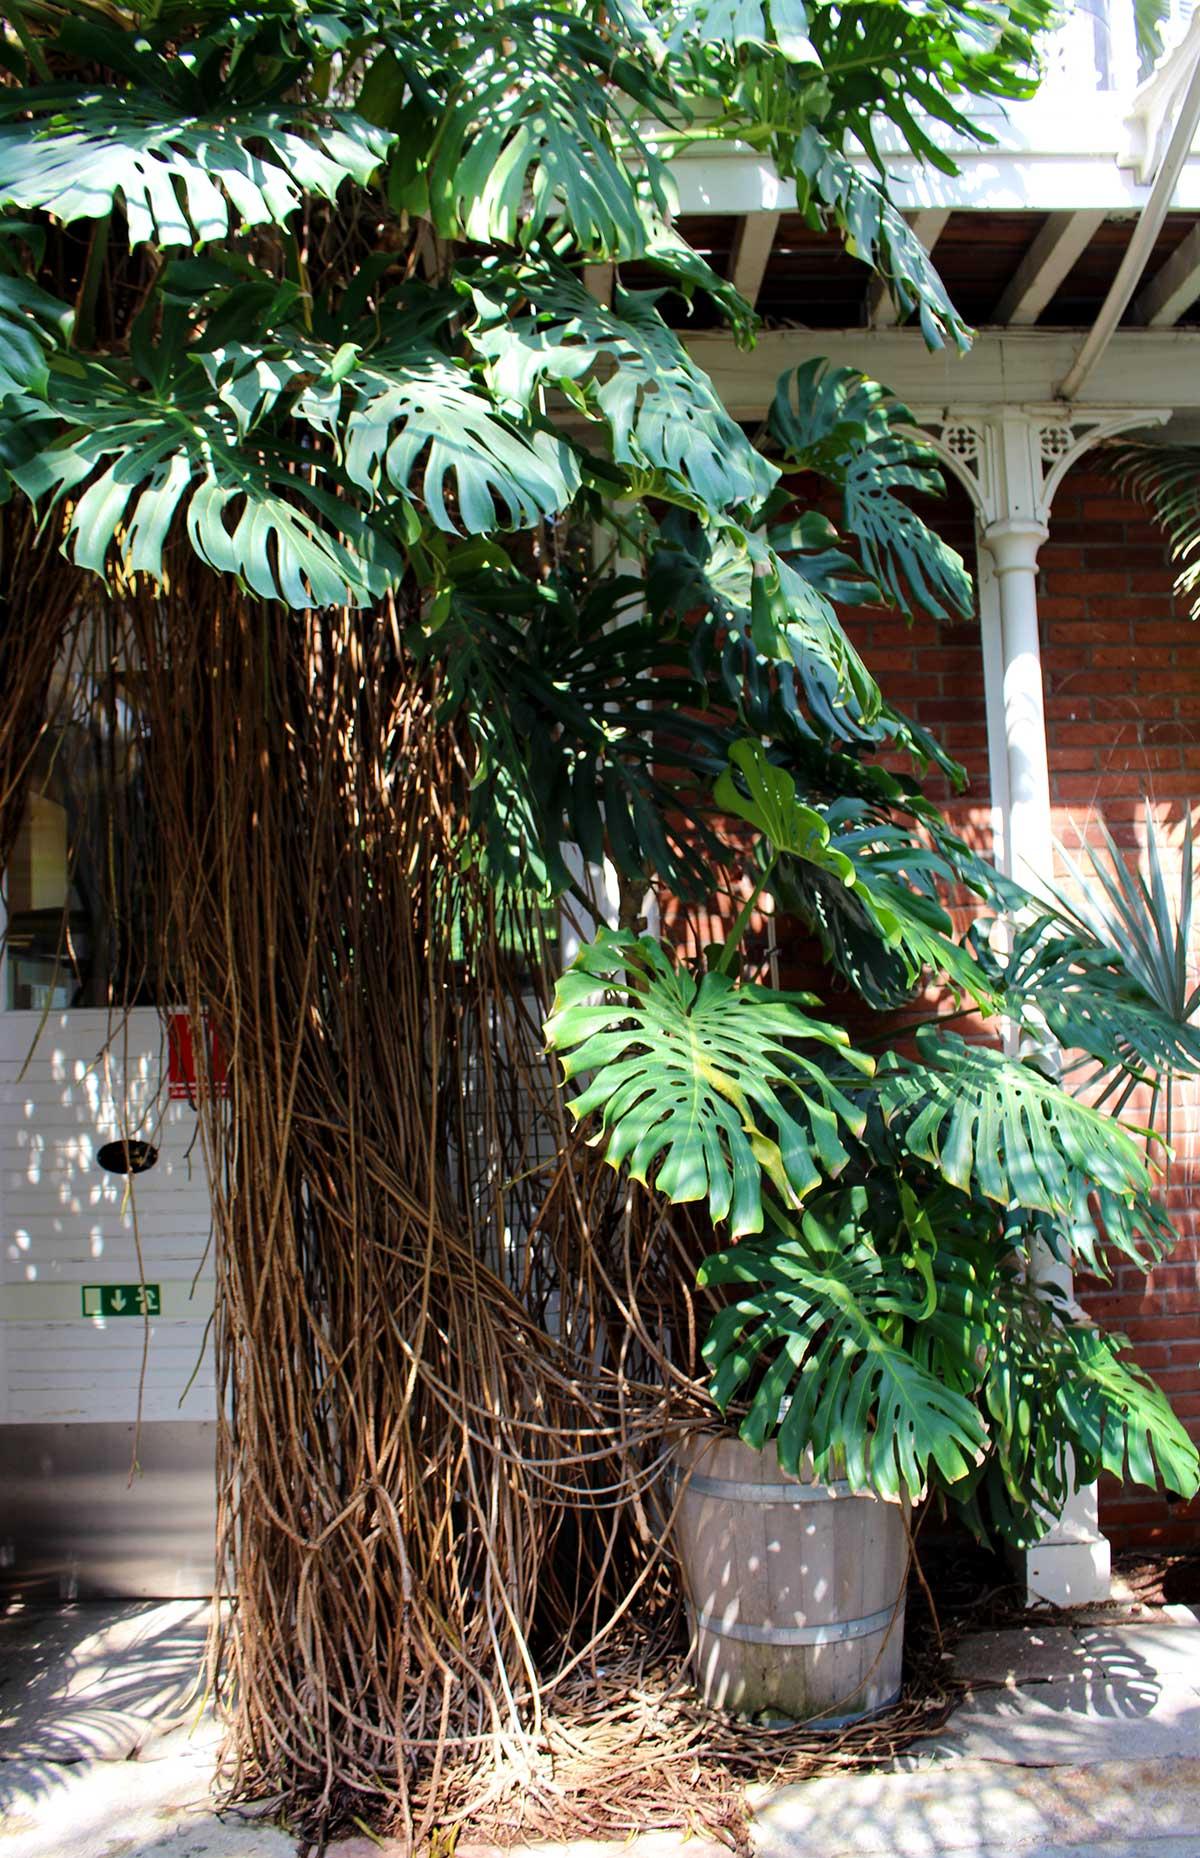 Palmhouse Garden Society, Gothenburg